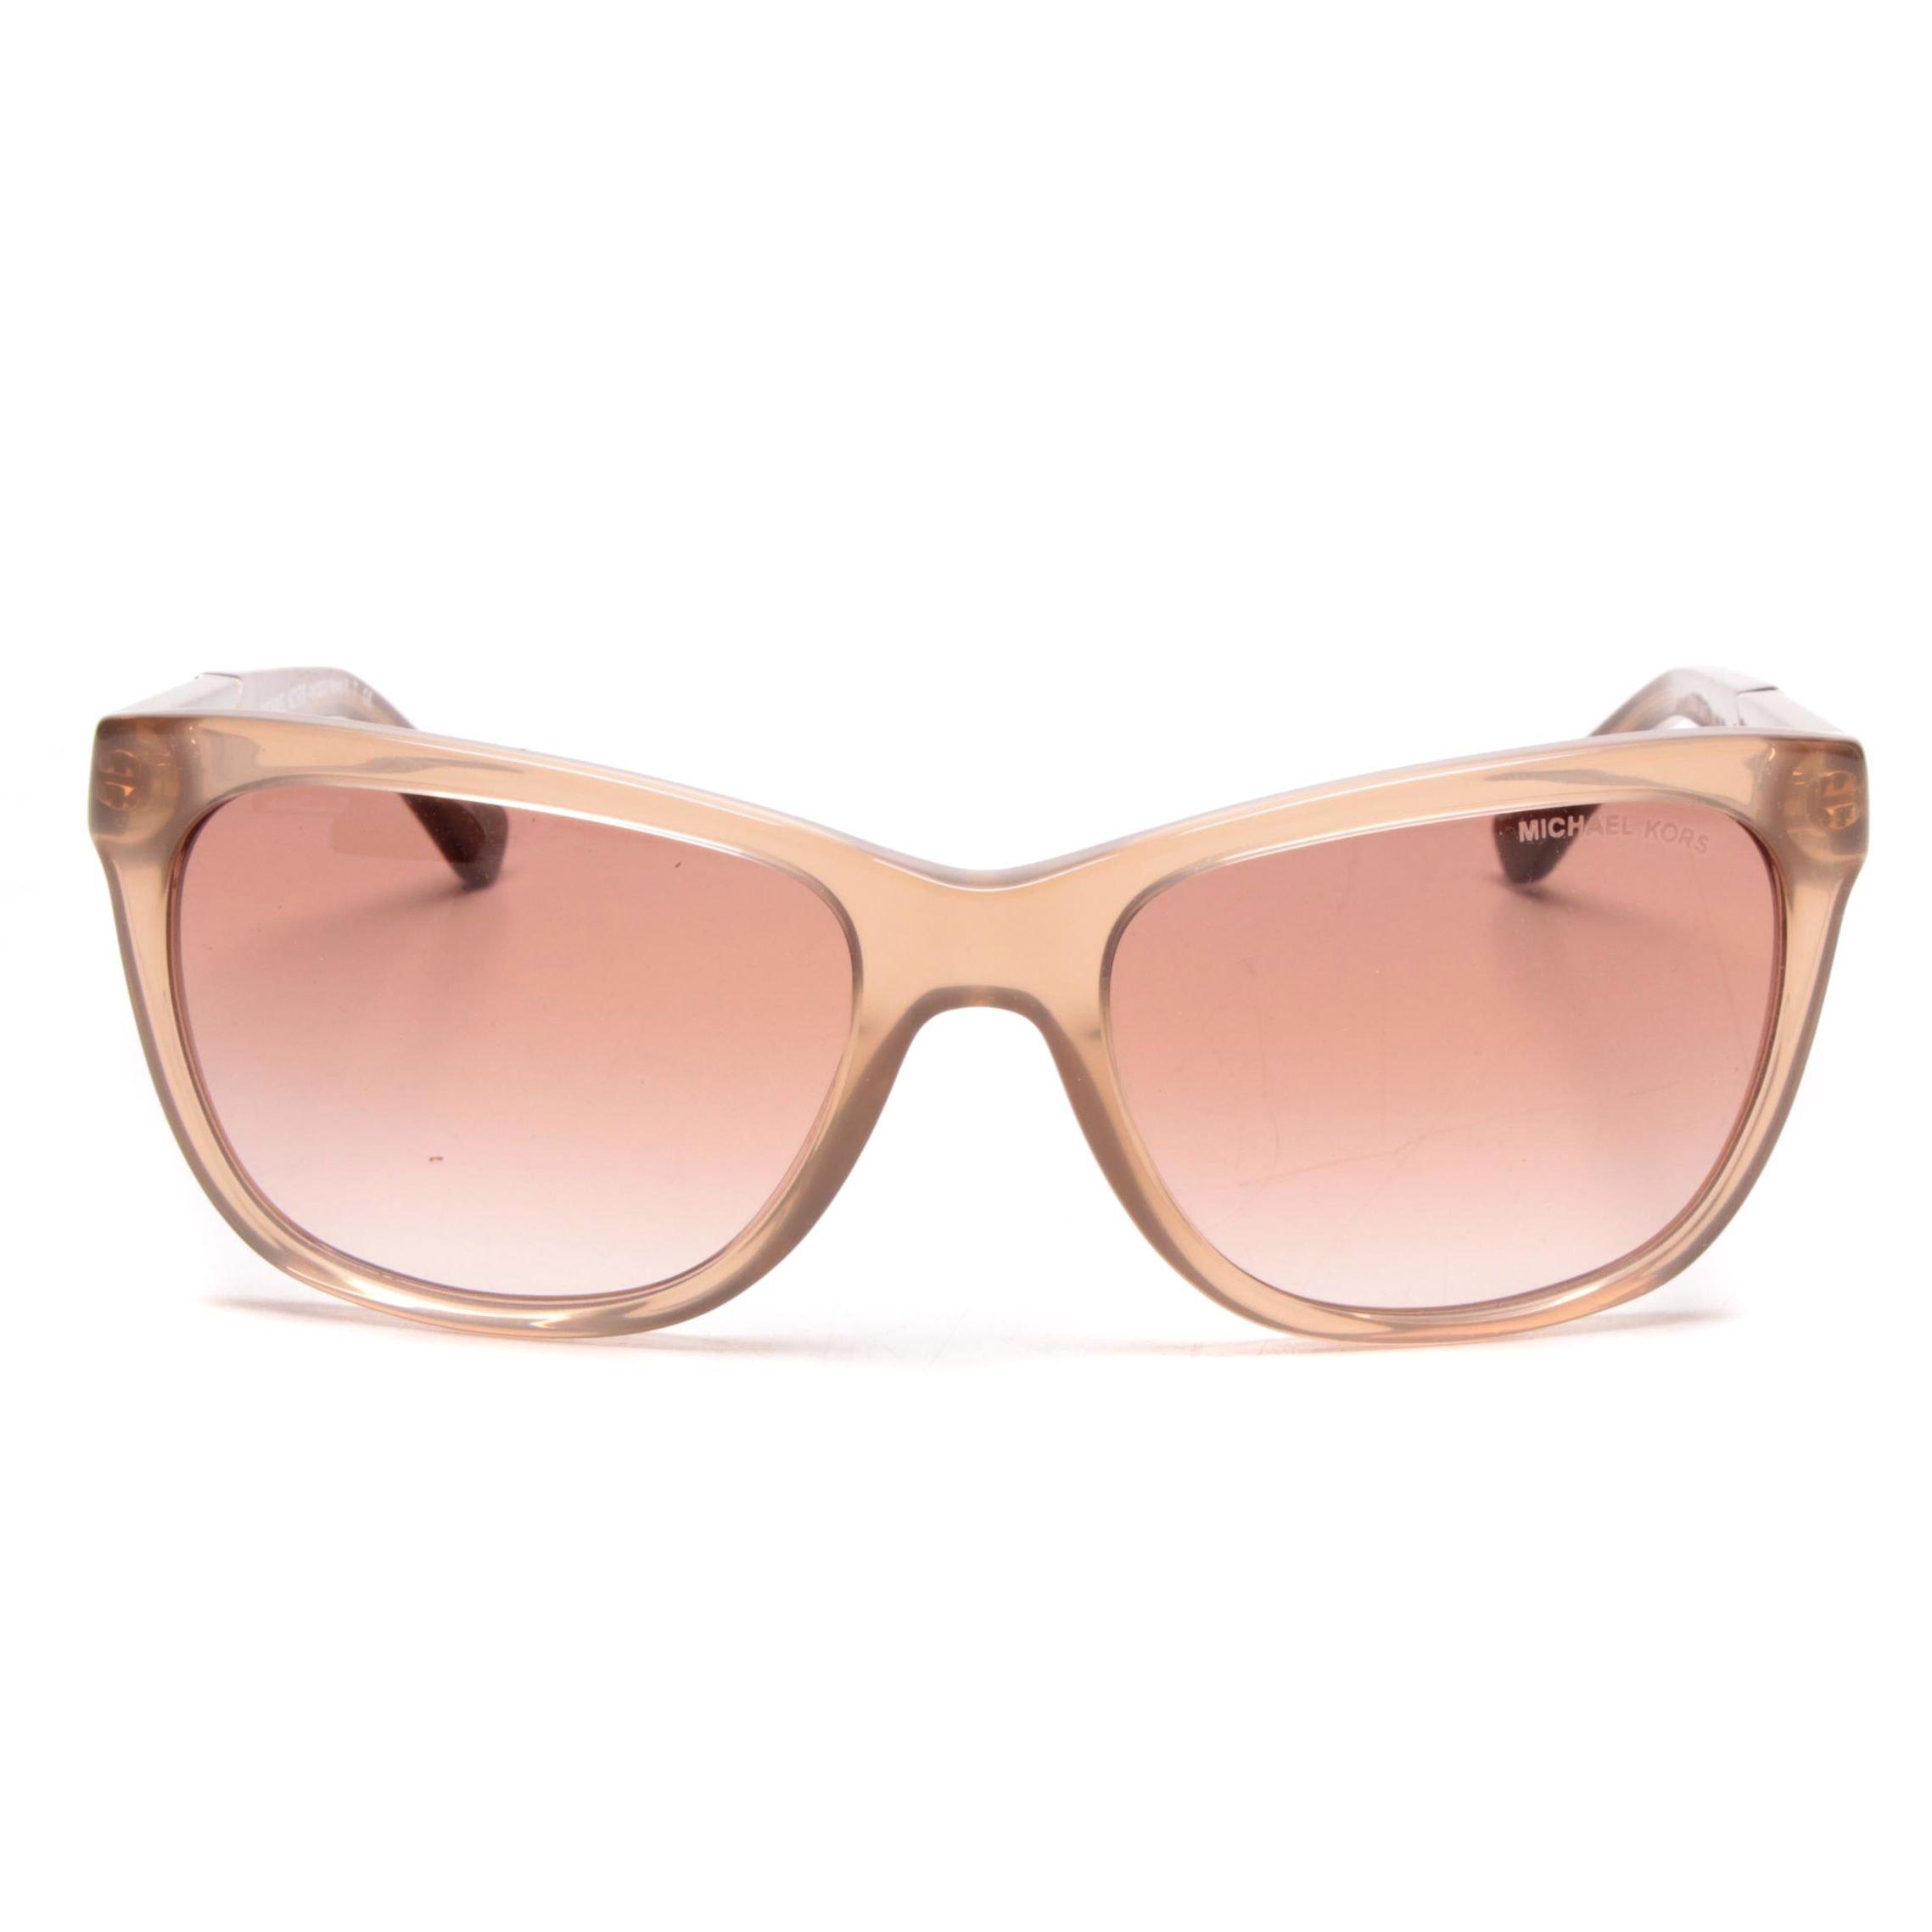 Michael Kors Rania II Translucent Tan and Animal Print Sunglasses with Case